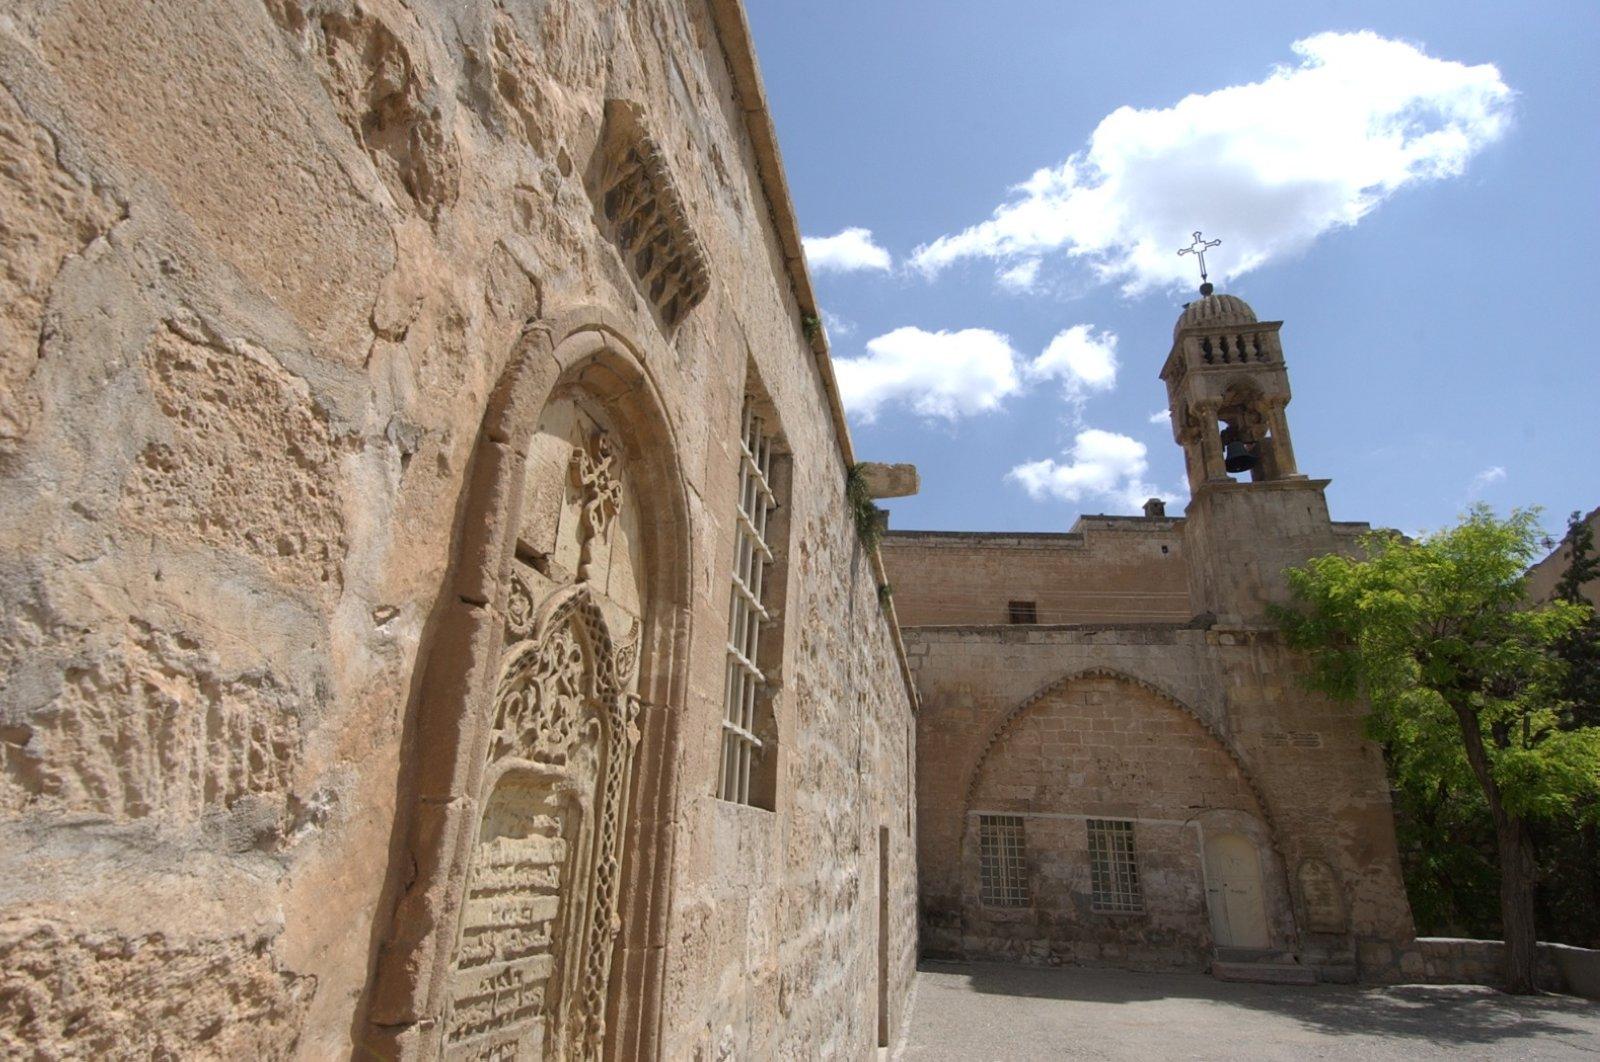 The historic Kırklar Church was unusually empty on Easter Sunday as the faithful followed guidelines to stem the spread of the coronavirus, Mardin, Turkey, April 19, 2020. (DHA Photo)